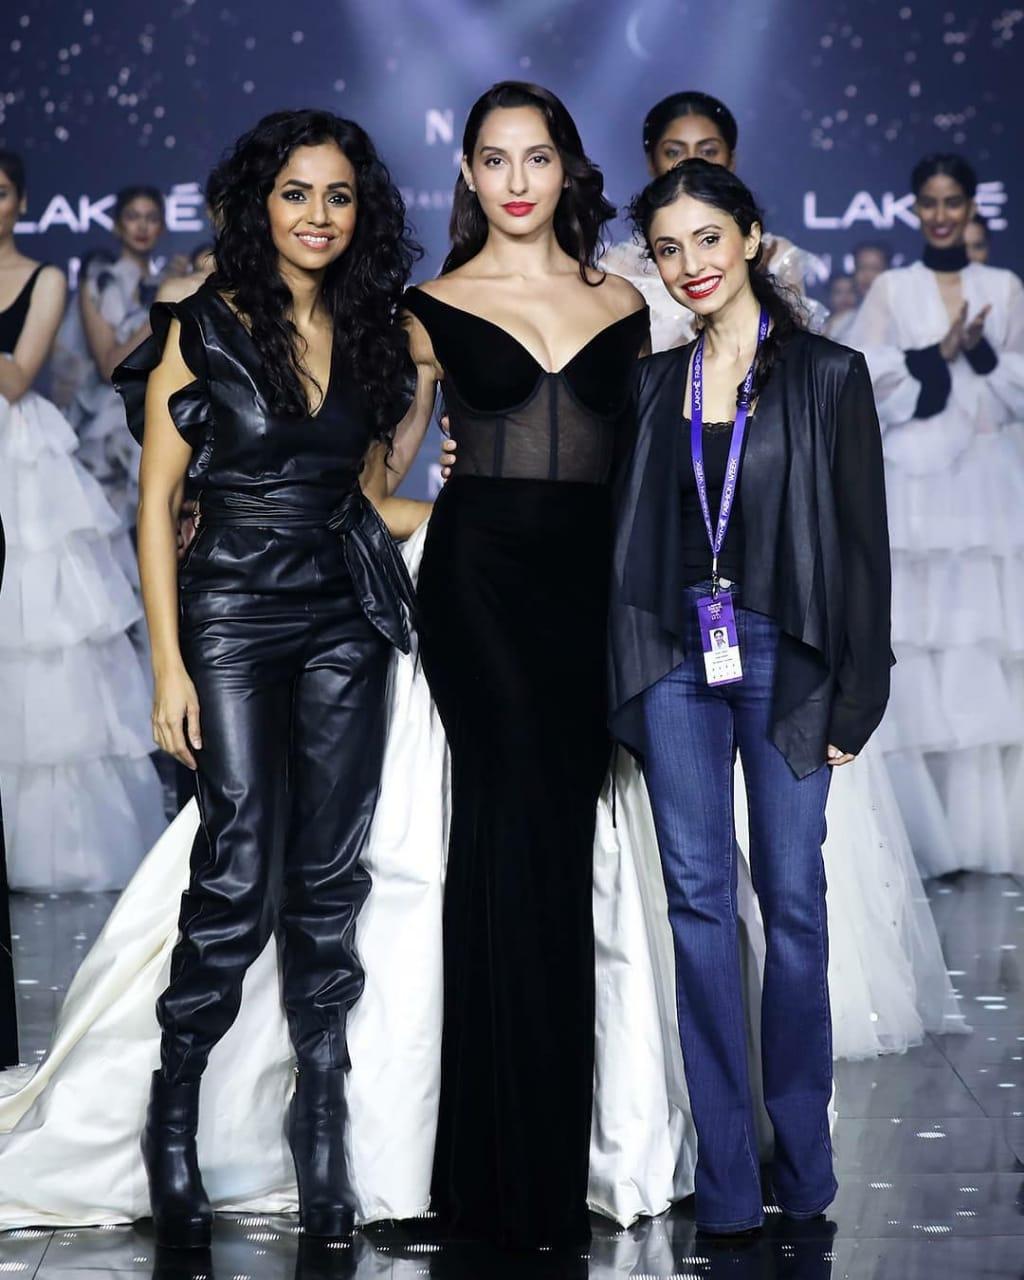 Mumbai Mumbai Lakme Fashion Week Actress Nora Fatehi Walks Ramp Pictures Here Hello Mumbai News